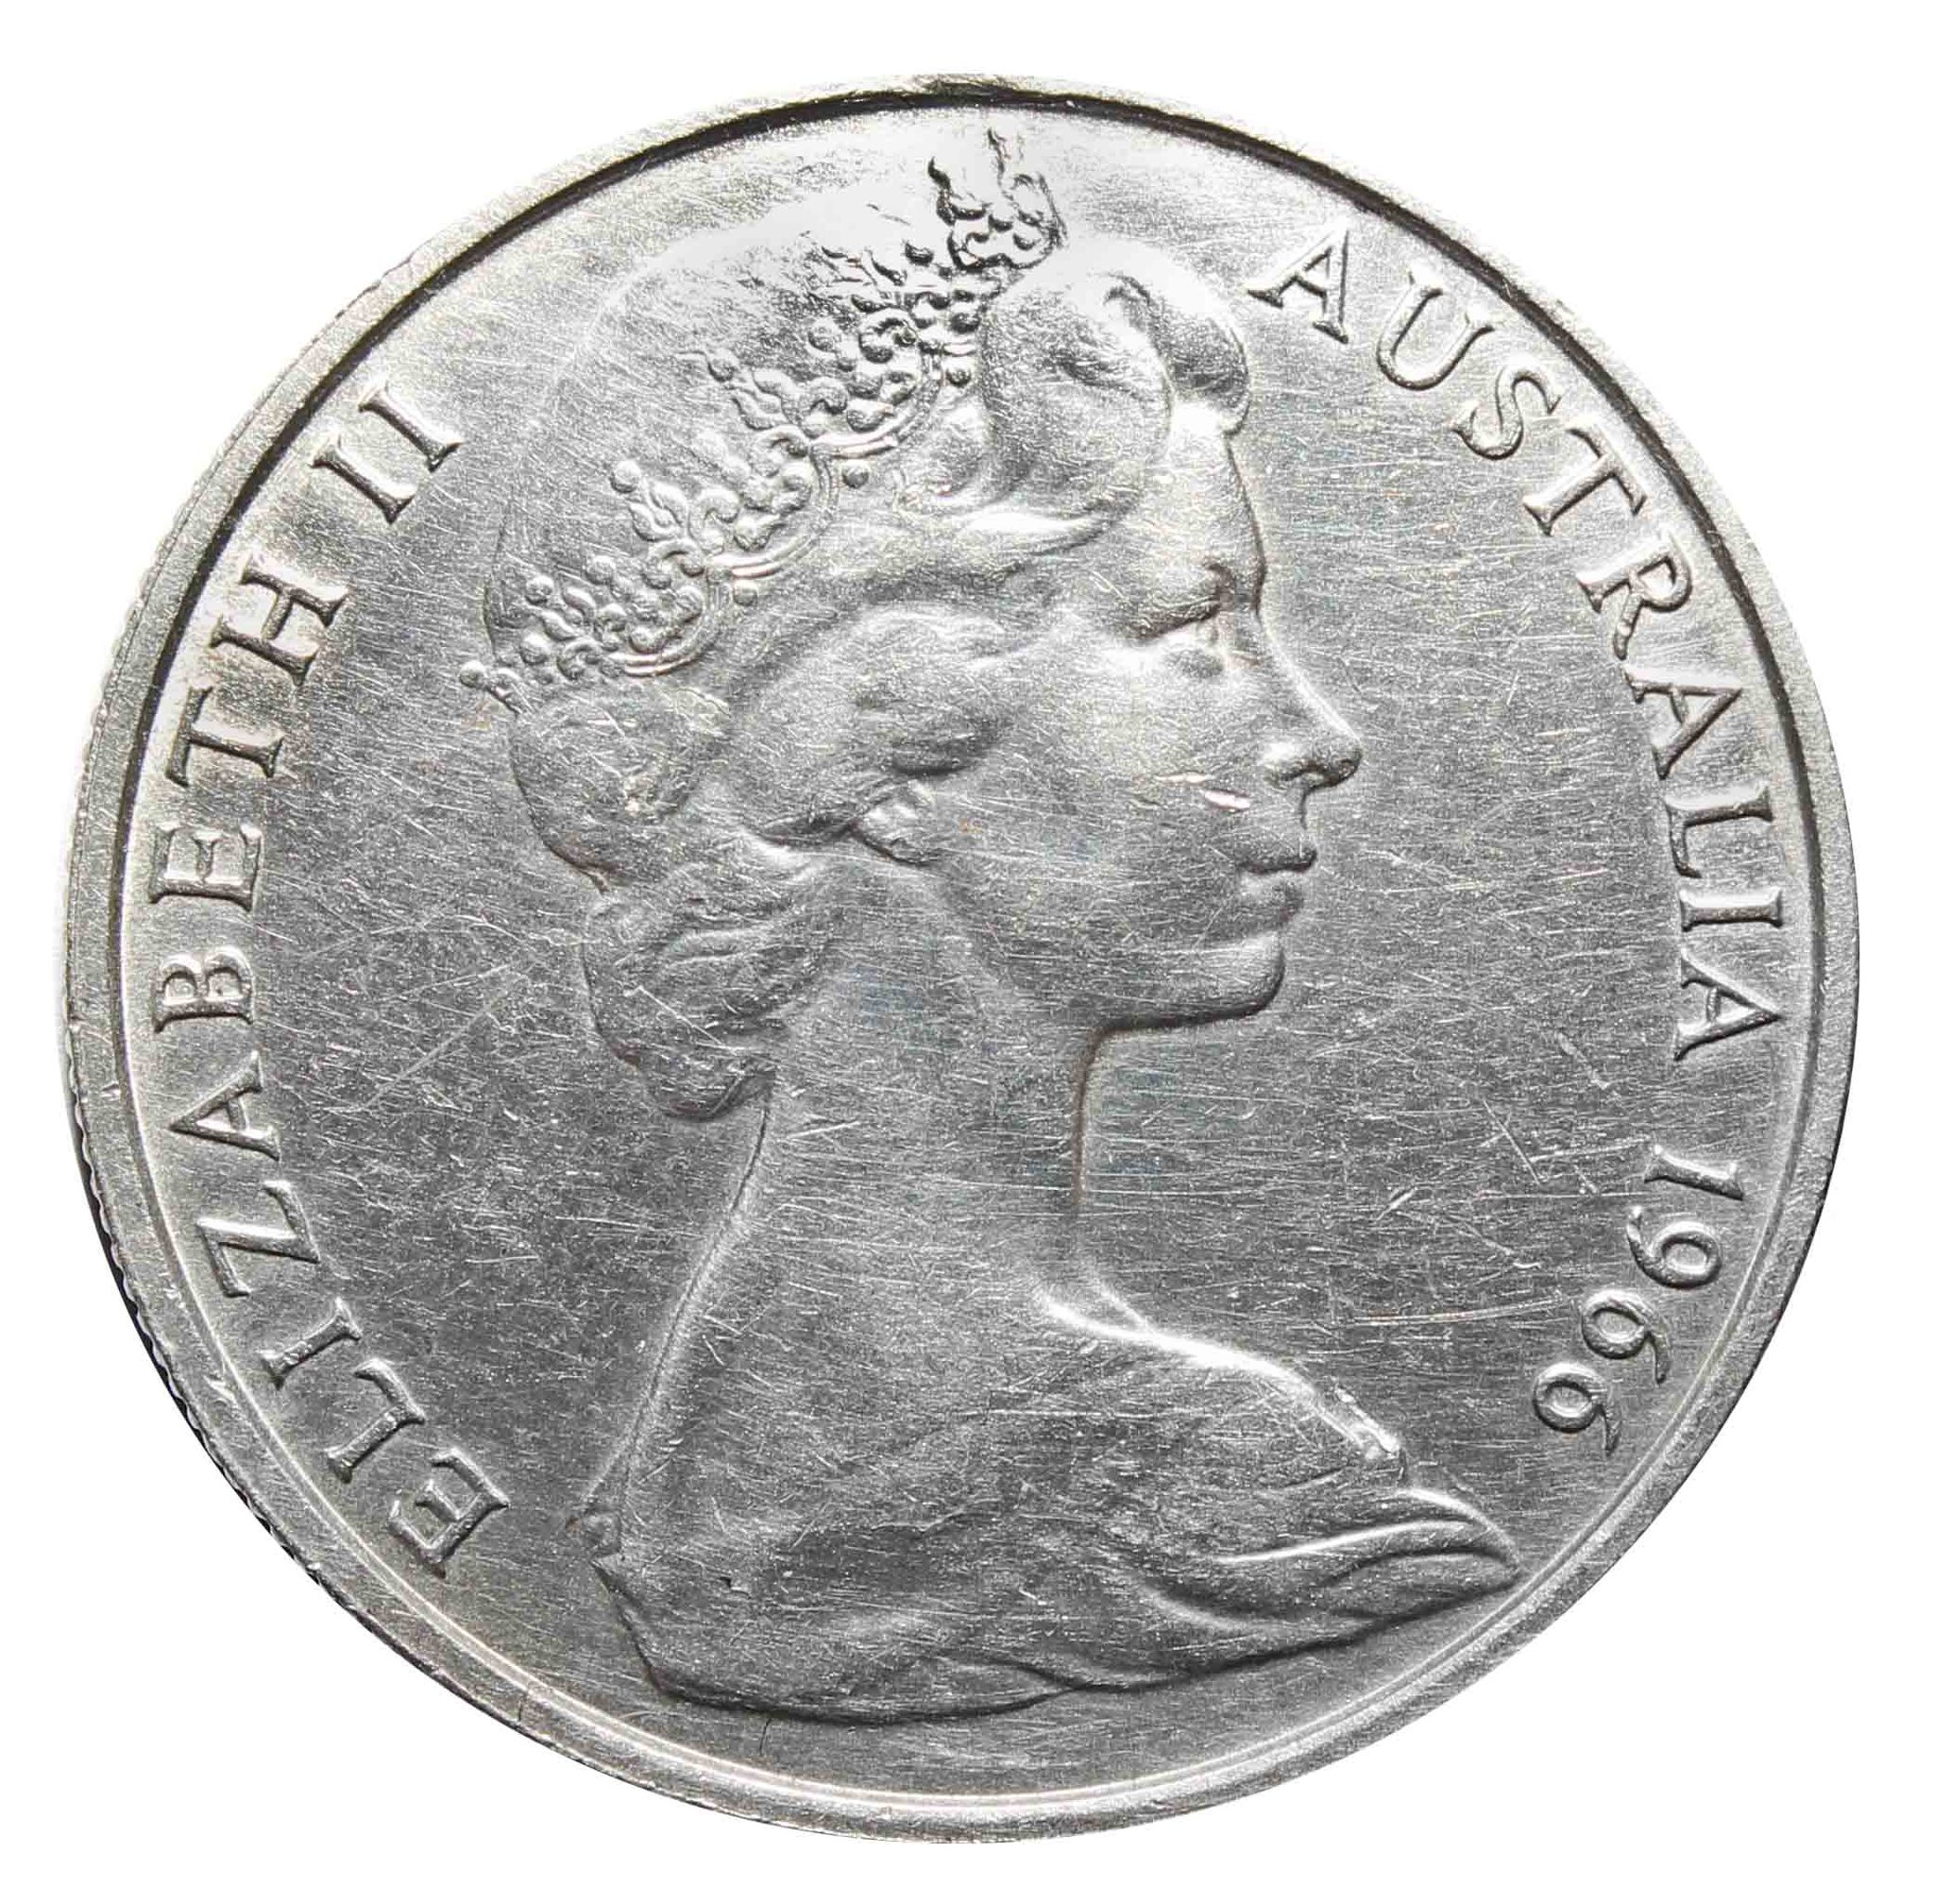 50 центов. Австралия. 1966 год. Серебро. VF-XF